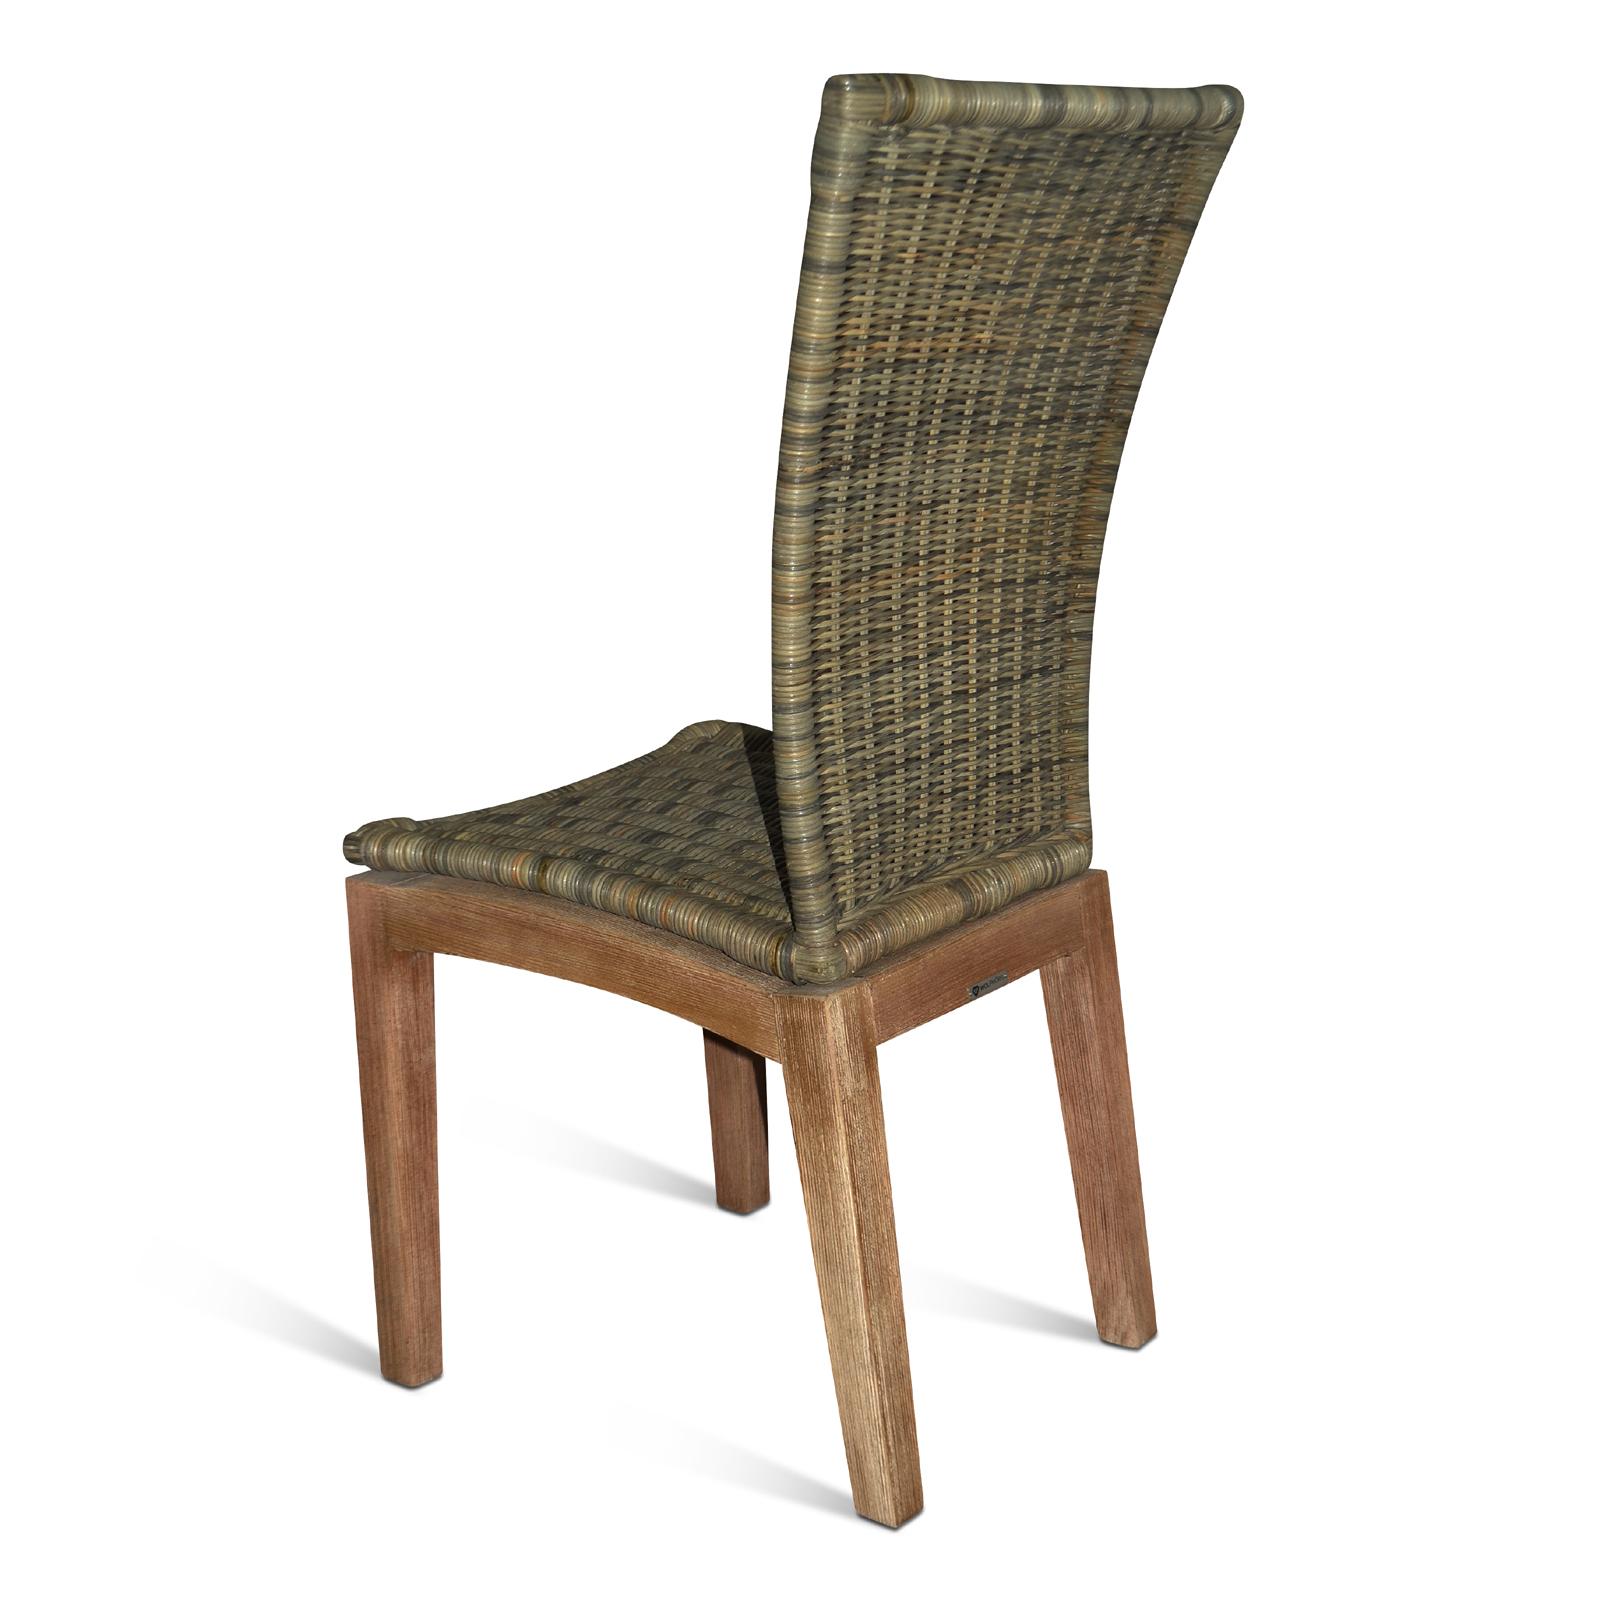 esszimmer rattanstuhle alles ber wohndesign und m belideen. Black Bedroom Furniture Sets. Home Design Ideas